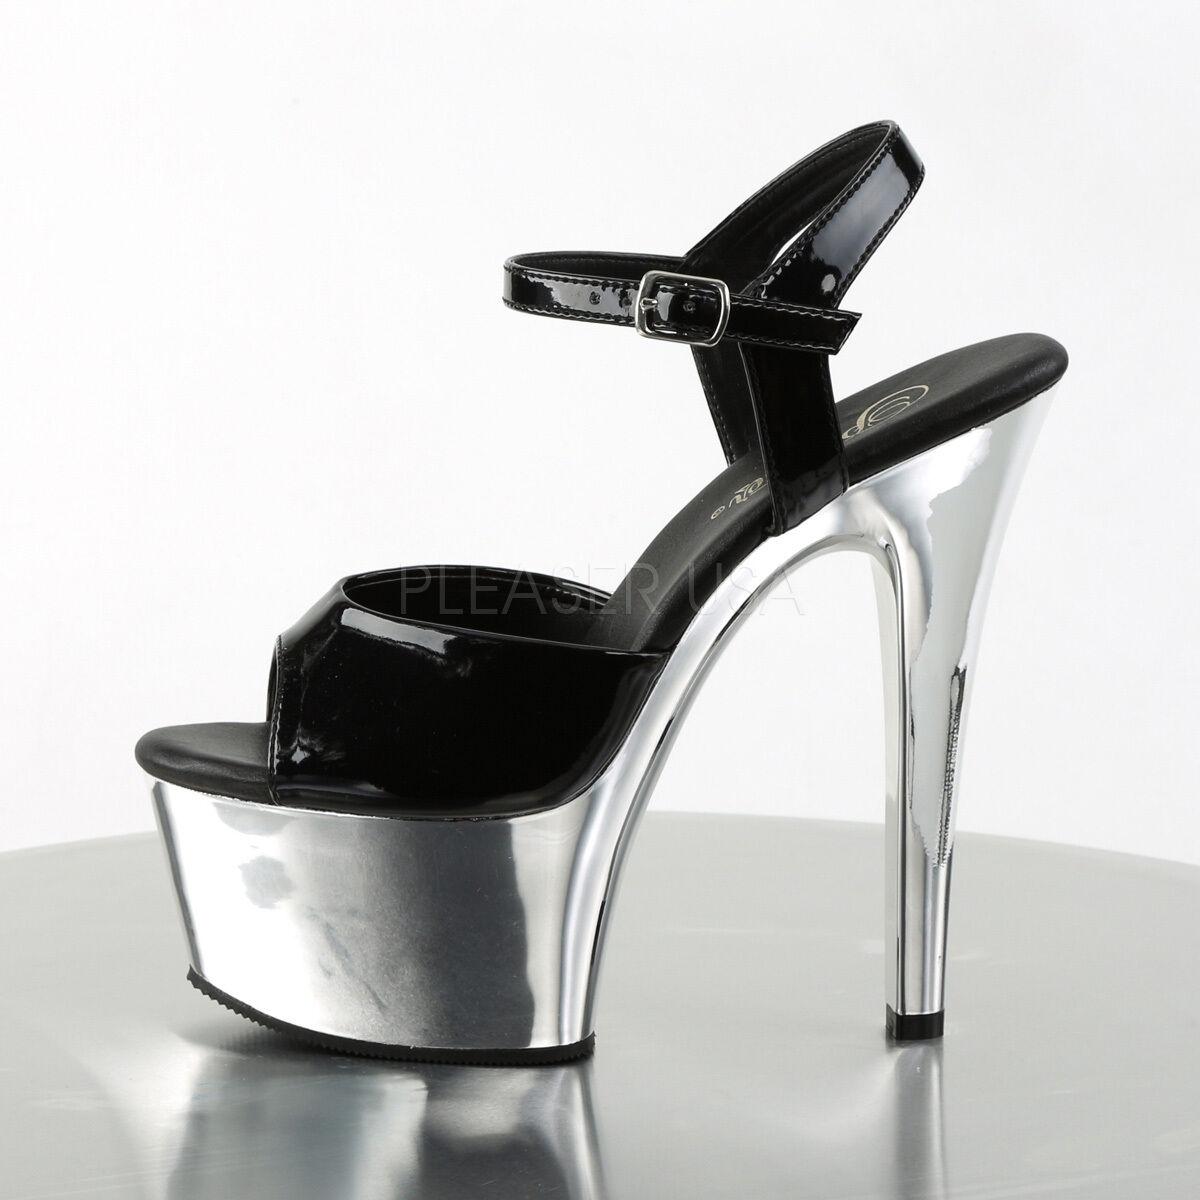 Pleaser schuhe Sexy Stripper Dancer Most Comfortable High Heel Heel Heel Chrome Platform 72b048